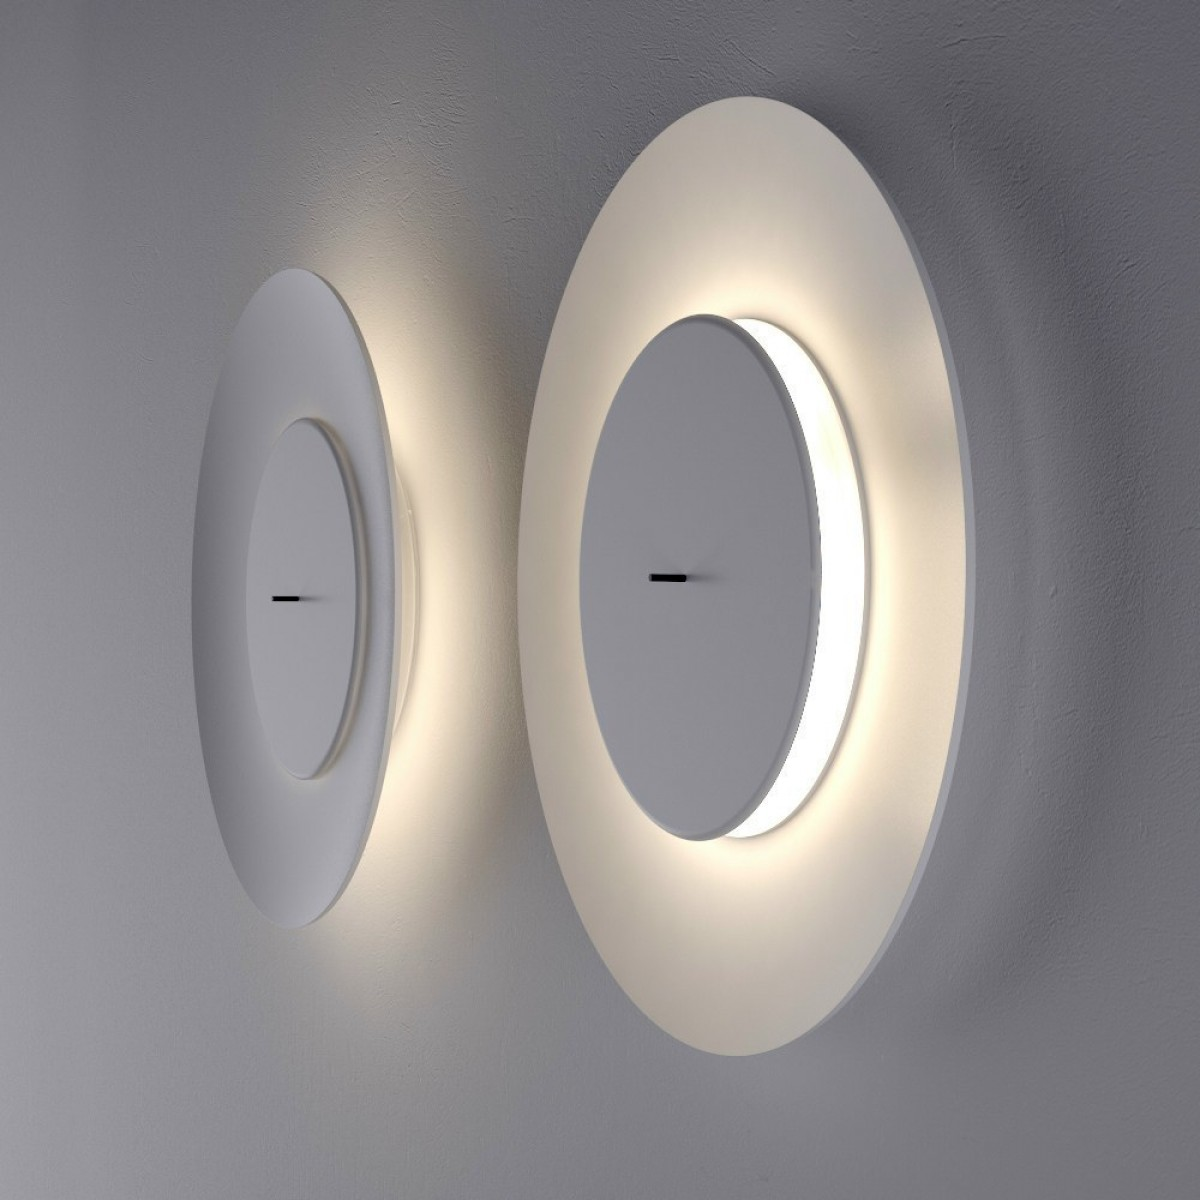 Fontanaarte Lunaire Bianca Wall Lamp Outlet Desout Com